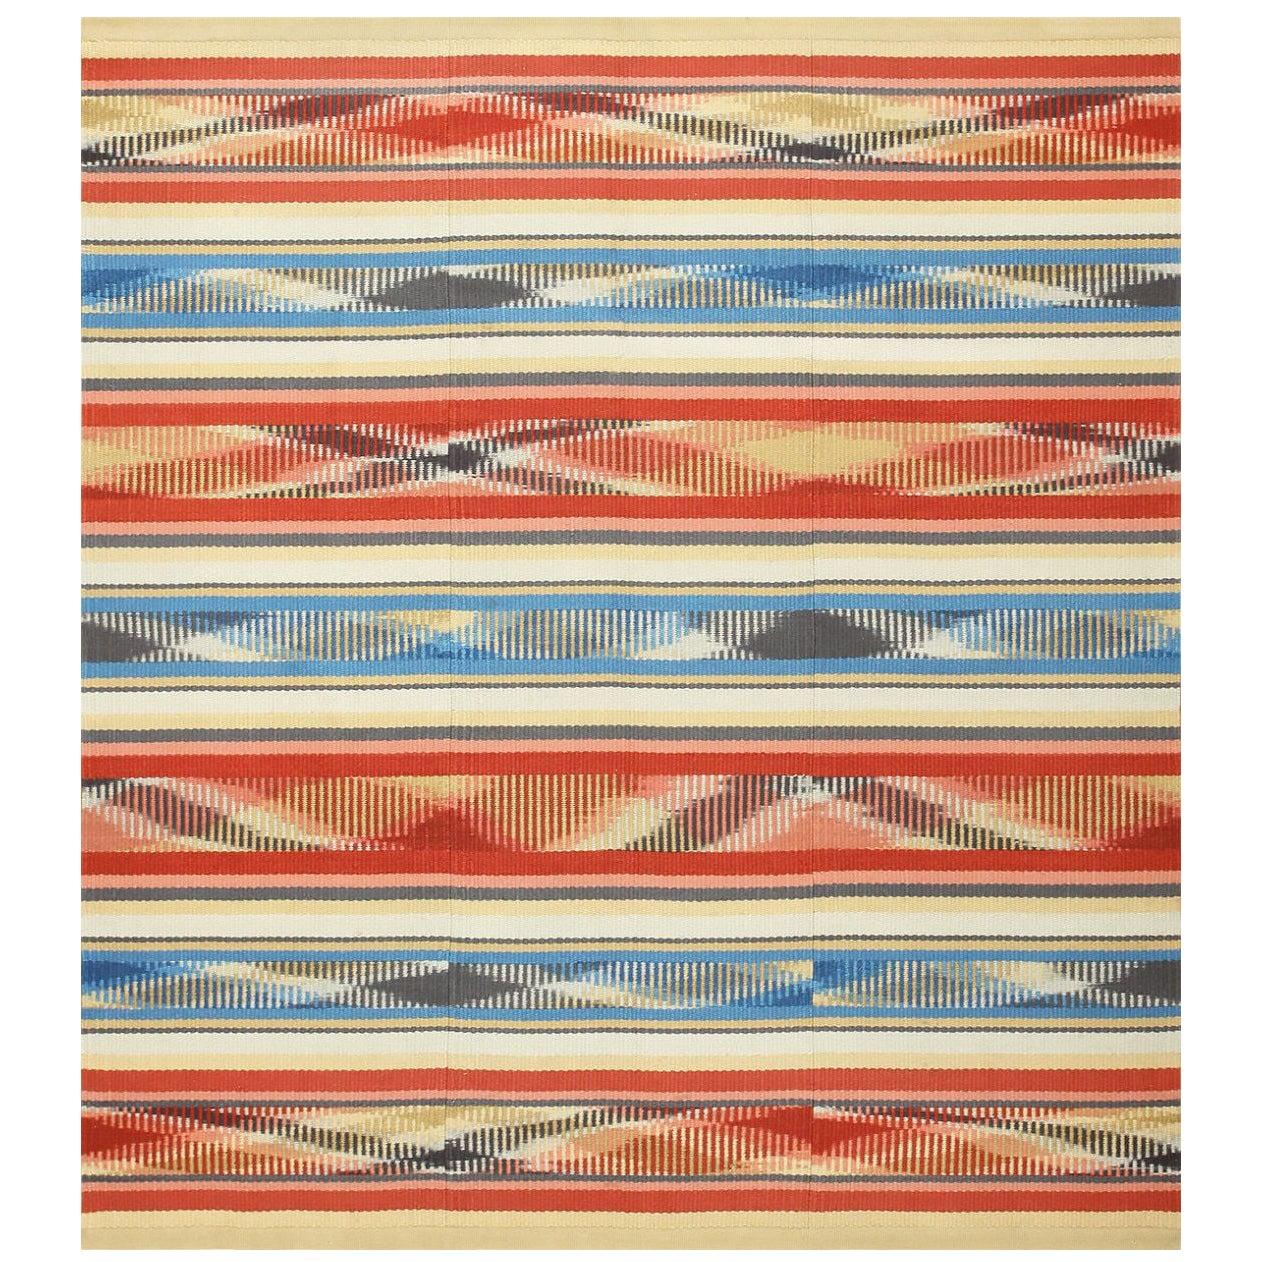 Beautiful Square Vintage Swedish Kilim Rug. Size: 7 ft x 7 ft 7 in